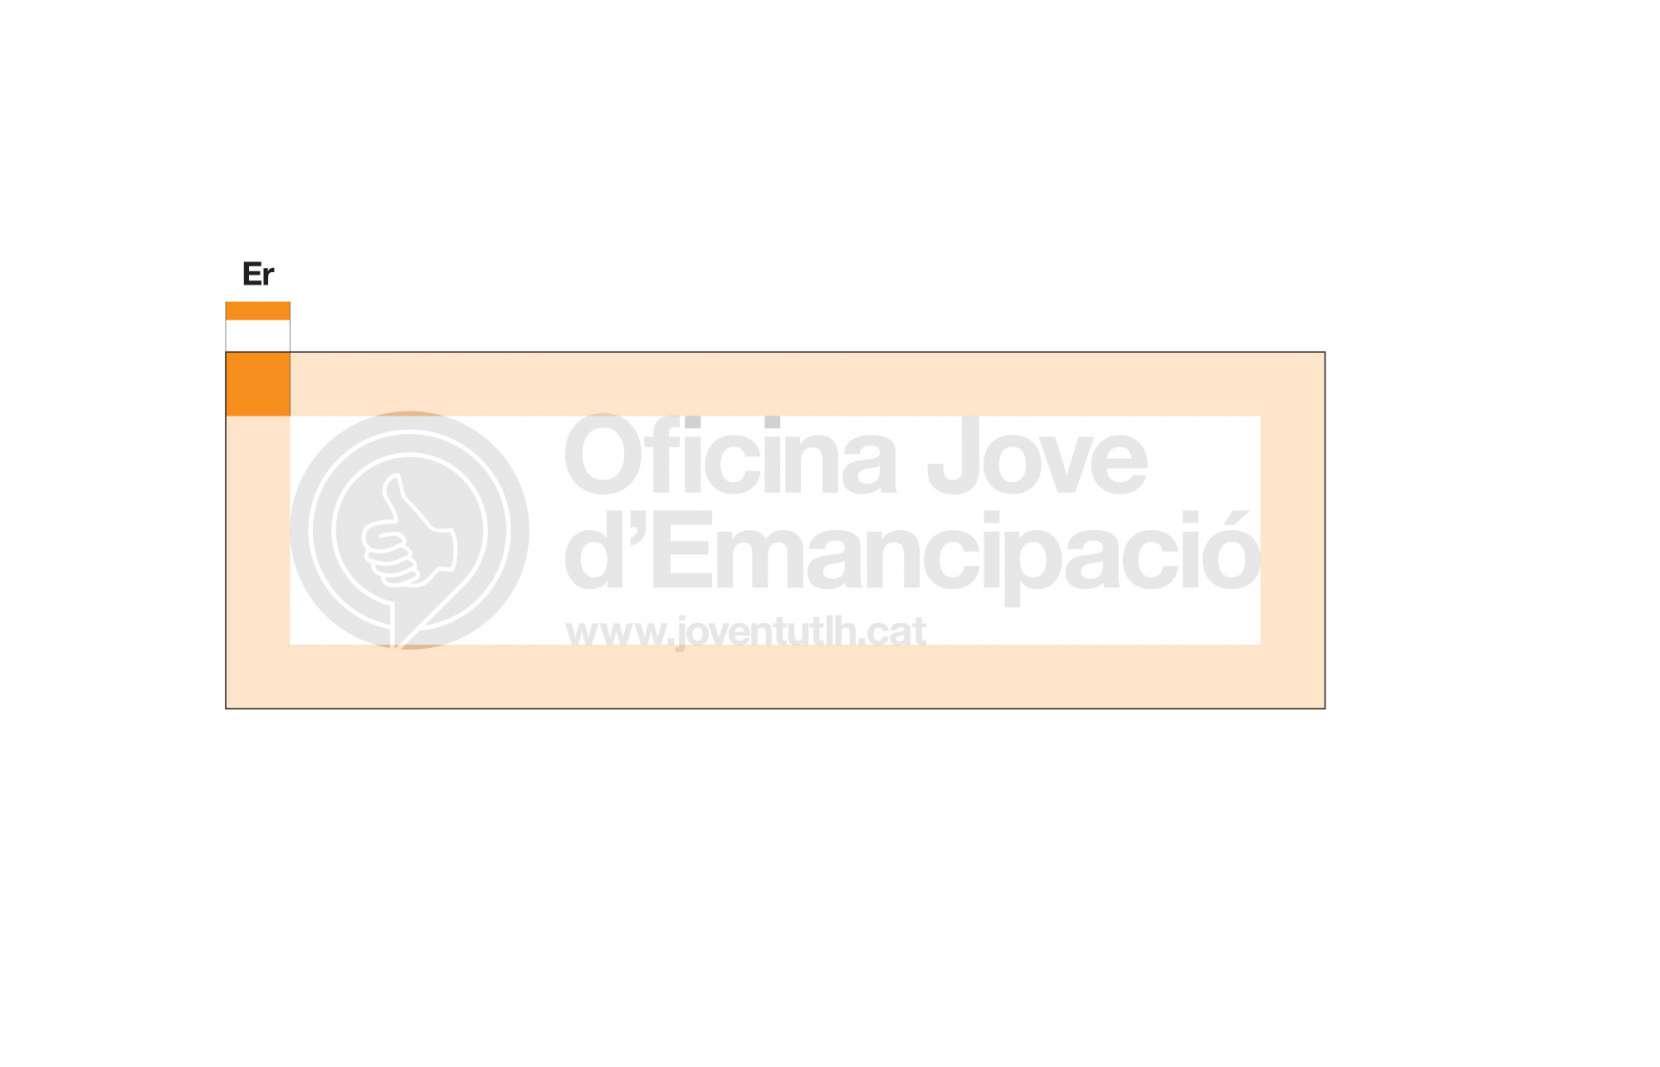 LH-OFICINAJOVE-MARCA-4.jpg